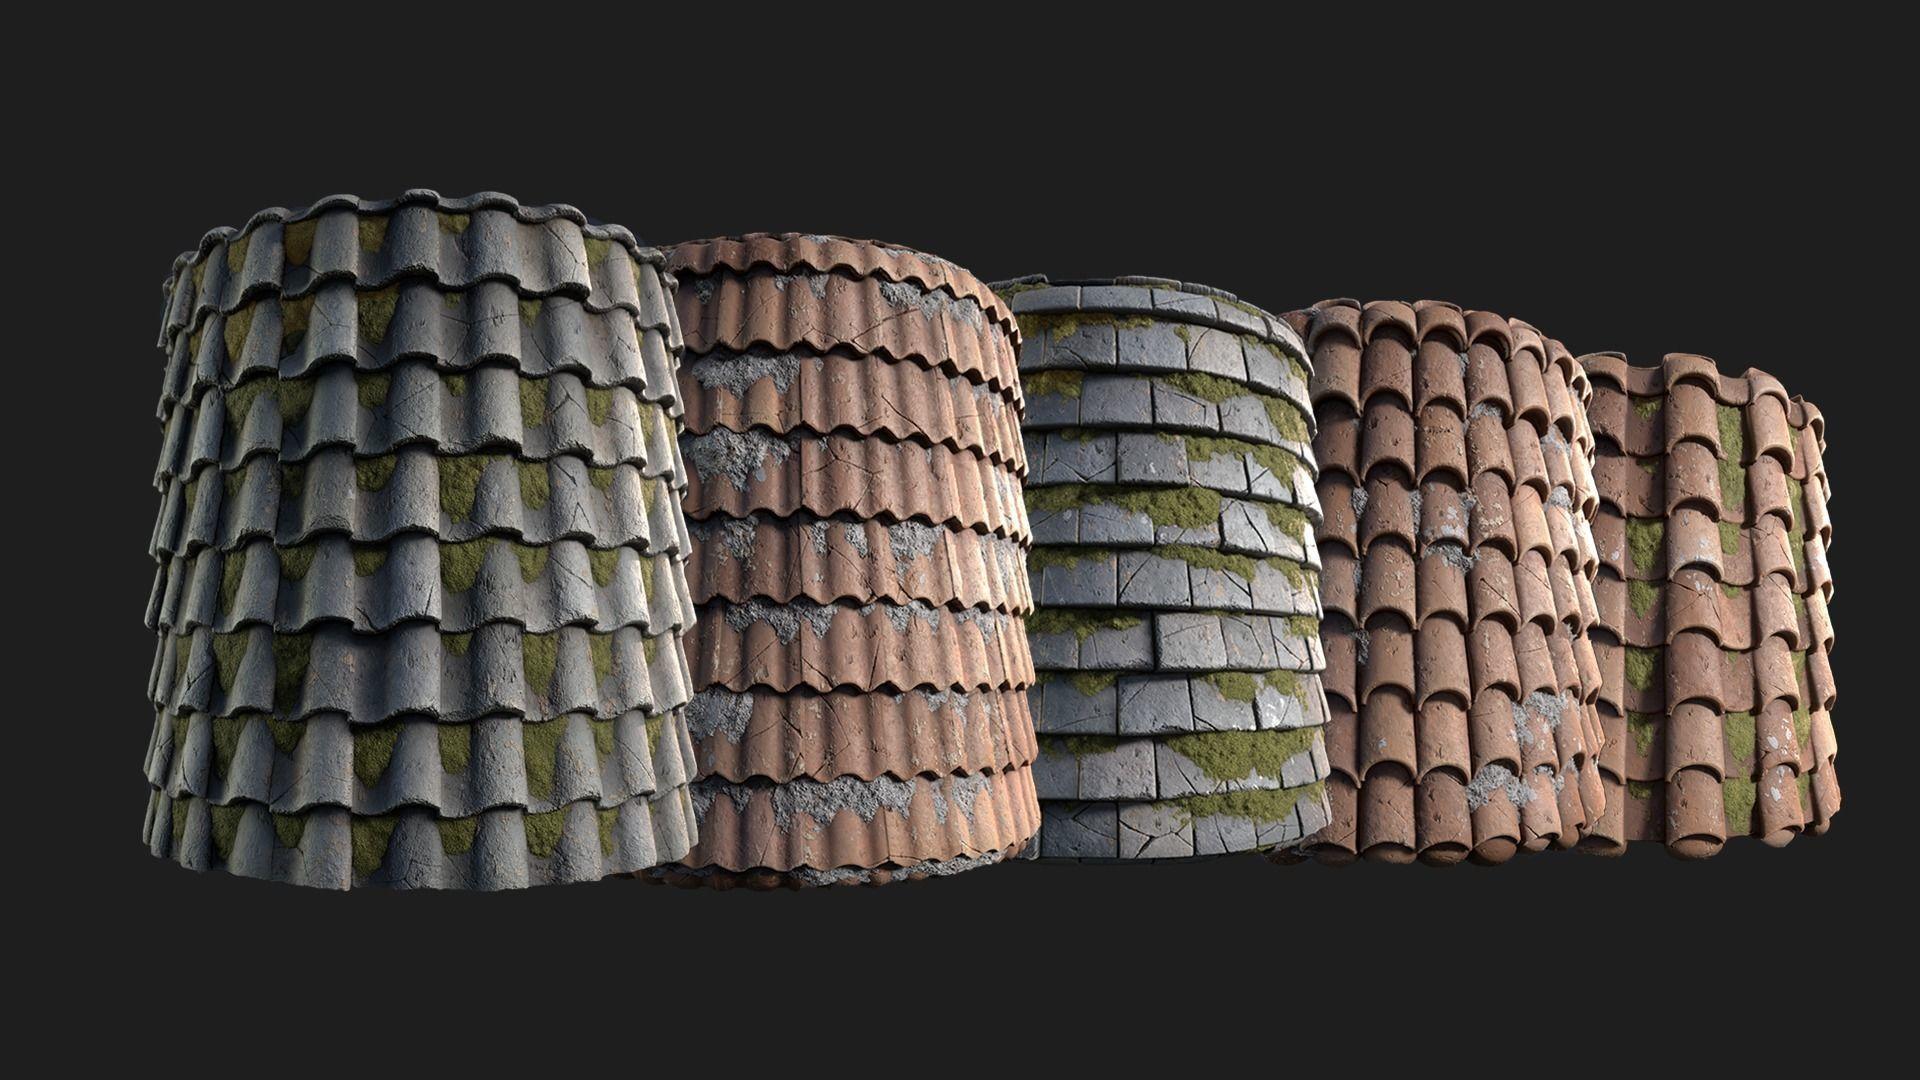 pbr roof tile generator texture